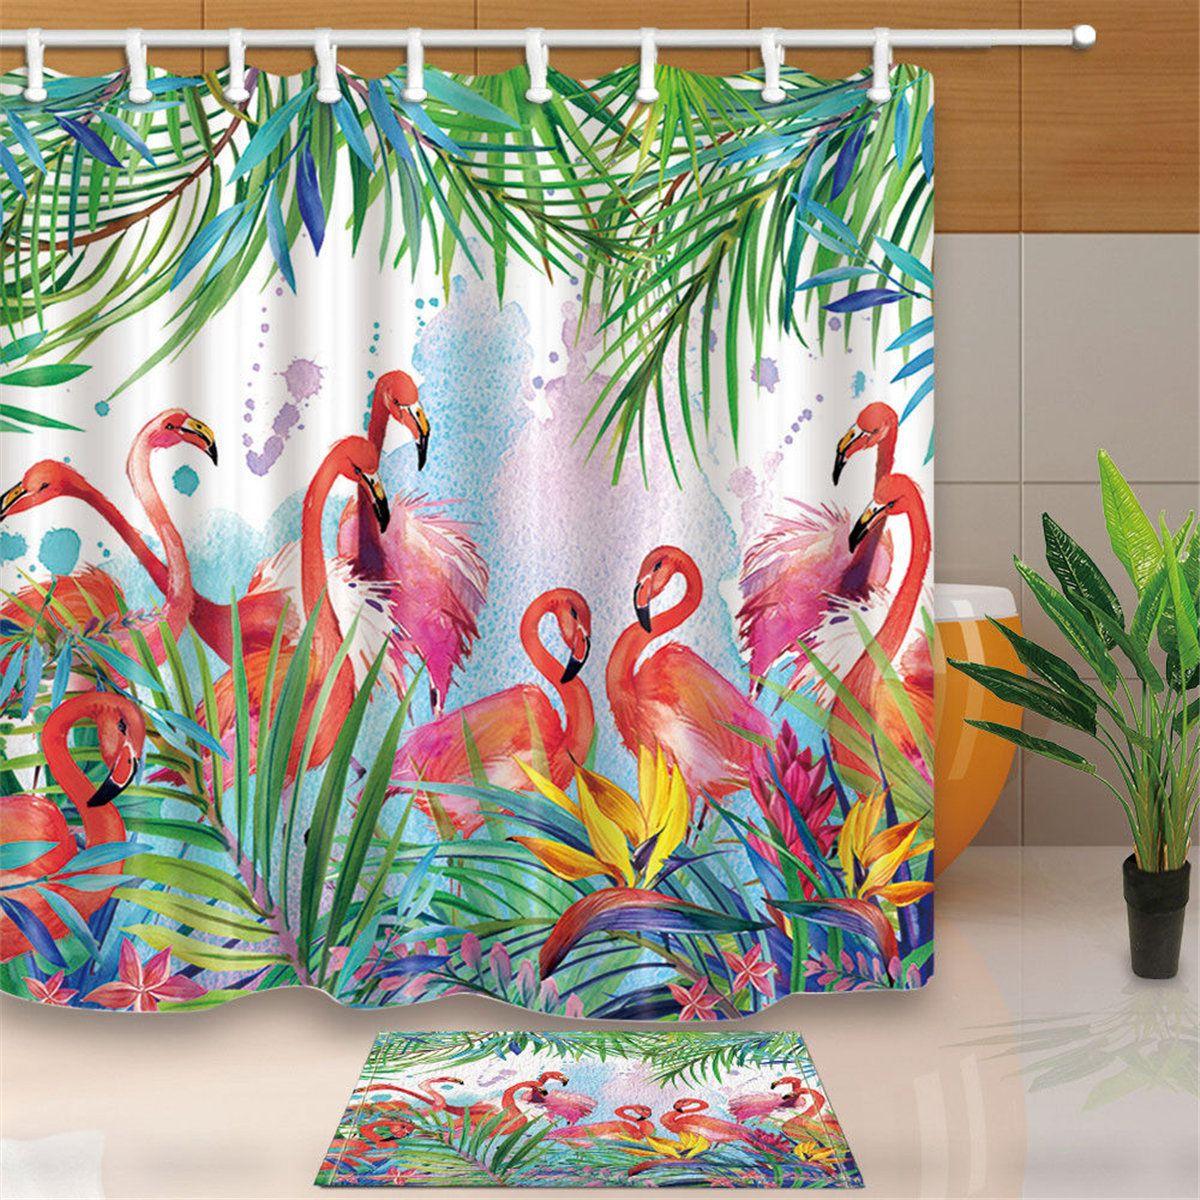 Tropical Flowers And Flamingo Theme Bathroom Shower Curtain